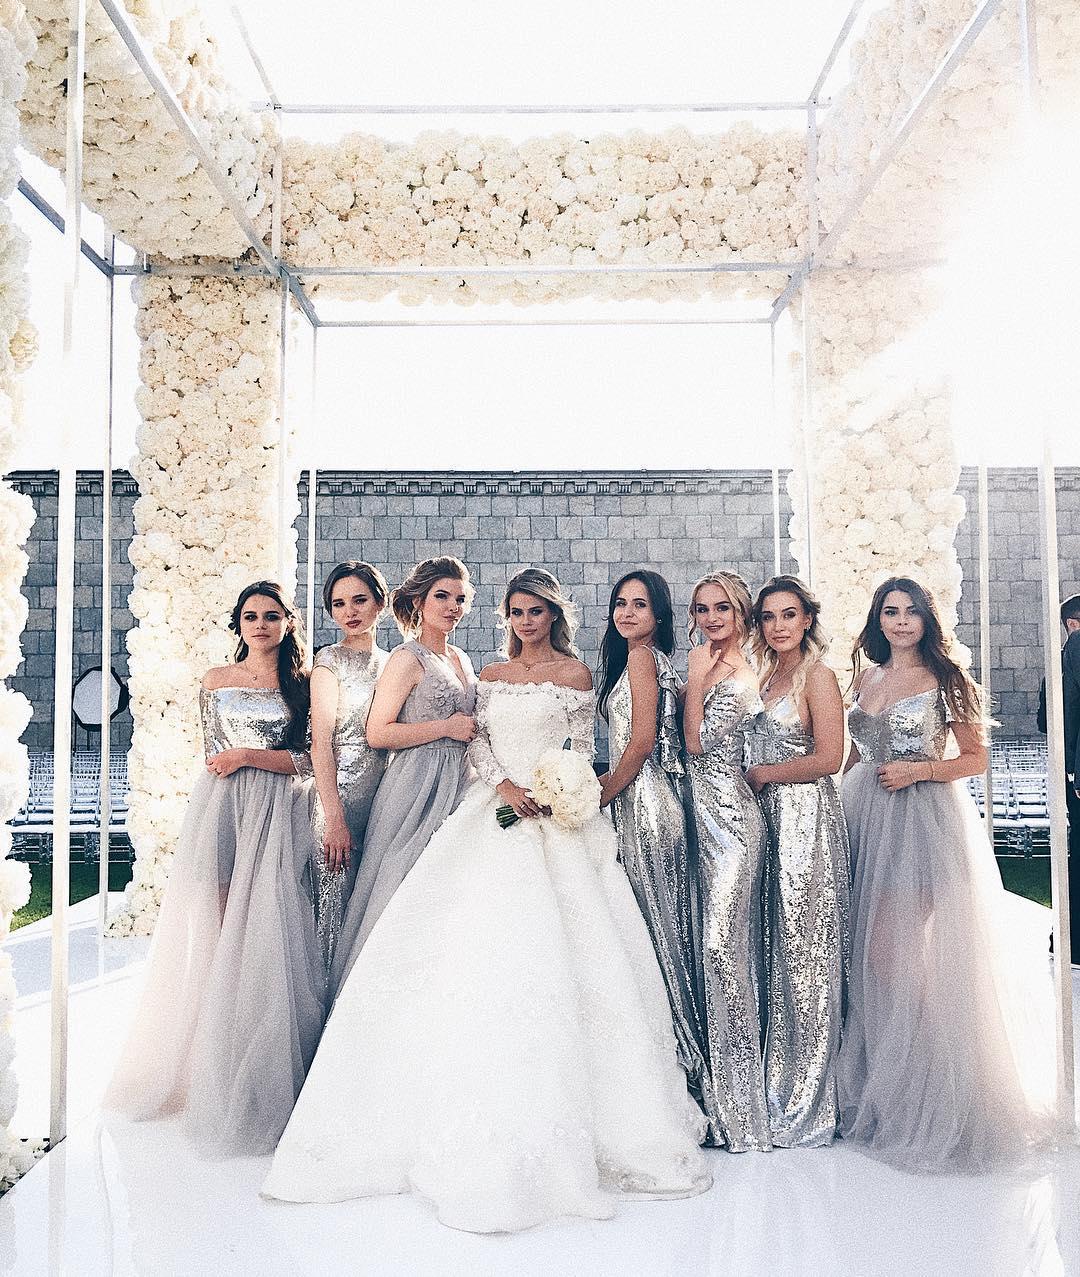 A luxurious wedding of grandson Alla Pugacheva turned into a scandal 17.08.2017 82